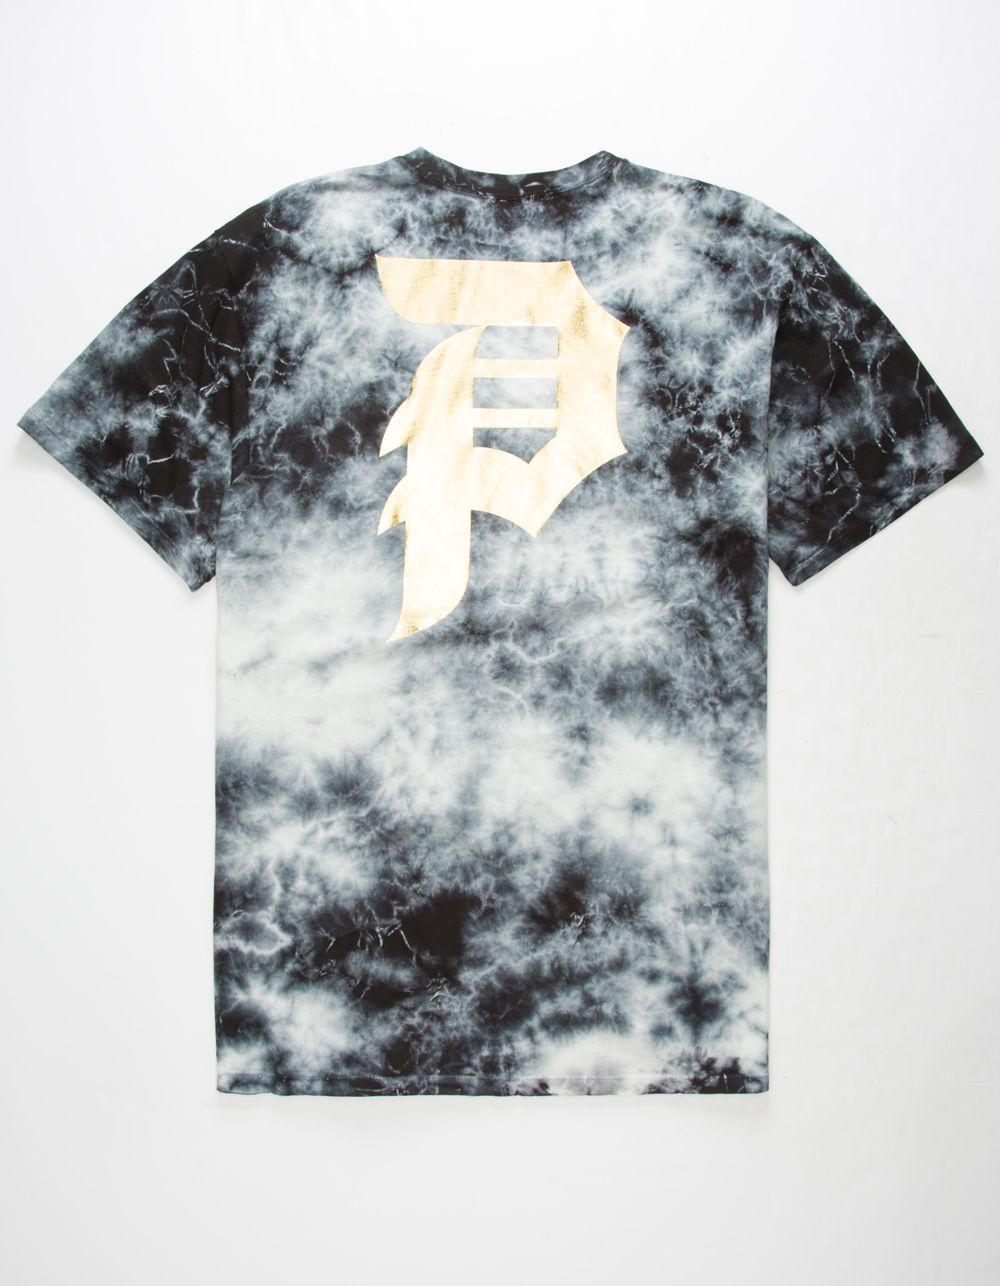 b7b65b8fad7 Primitive Dirty P Foil Mens T-shirt in White for Men - Lyst